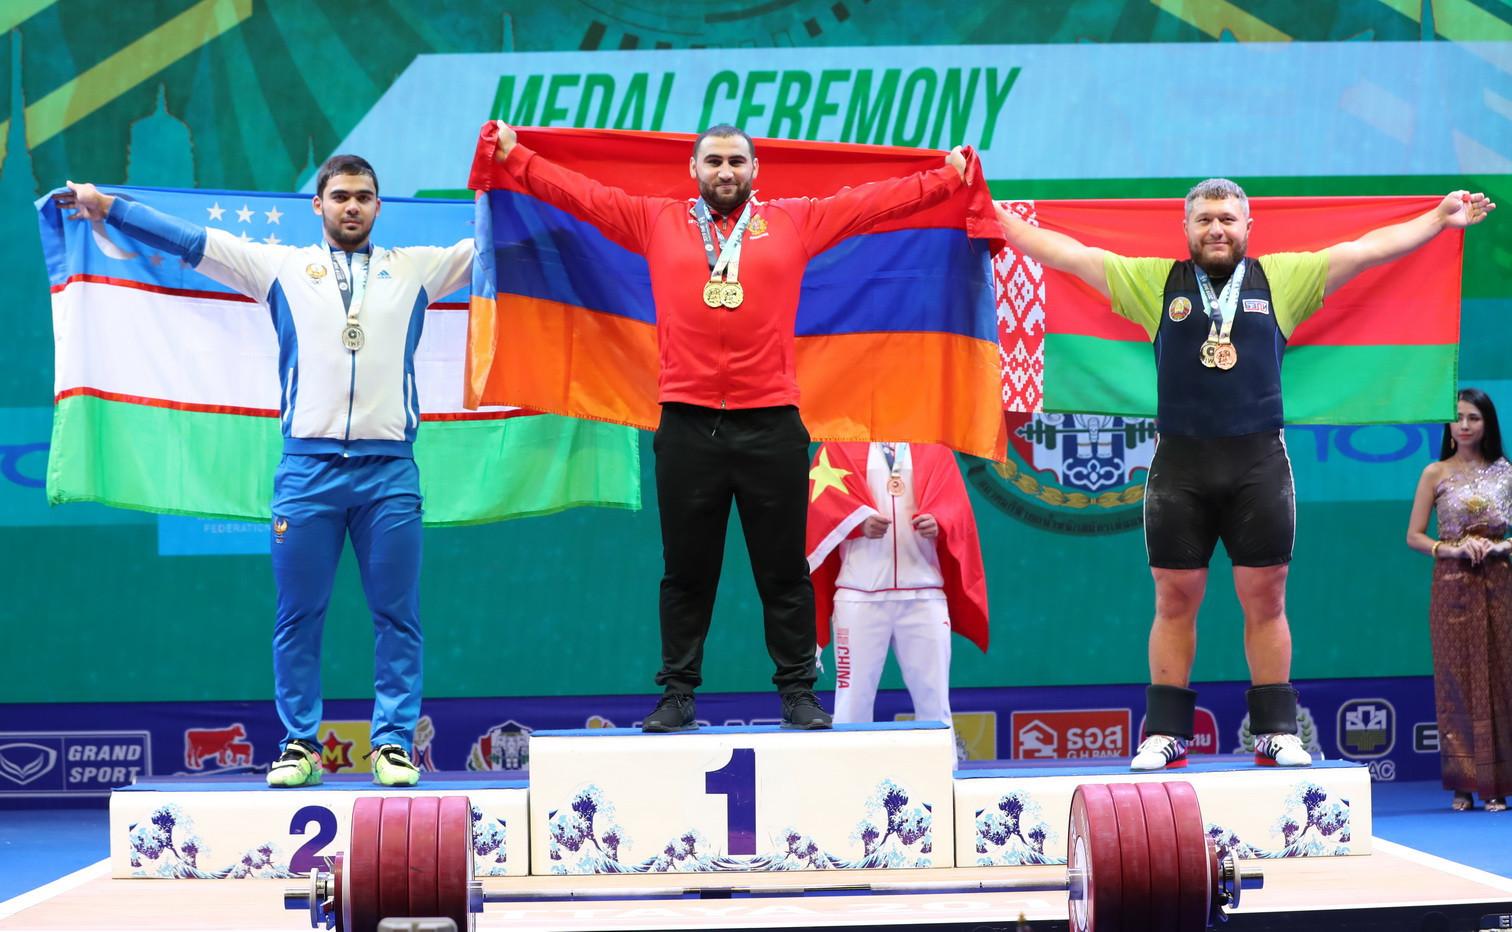 Uzbekistan's Akbar Djuraev, left, joined Martirosyan and Aramnau on the clean and jerk podium ©IWF